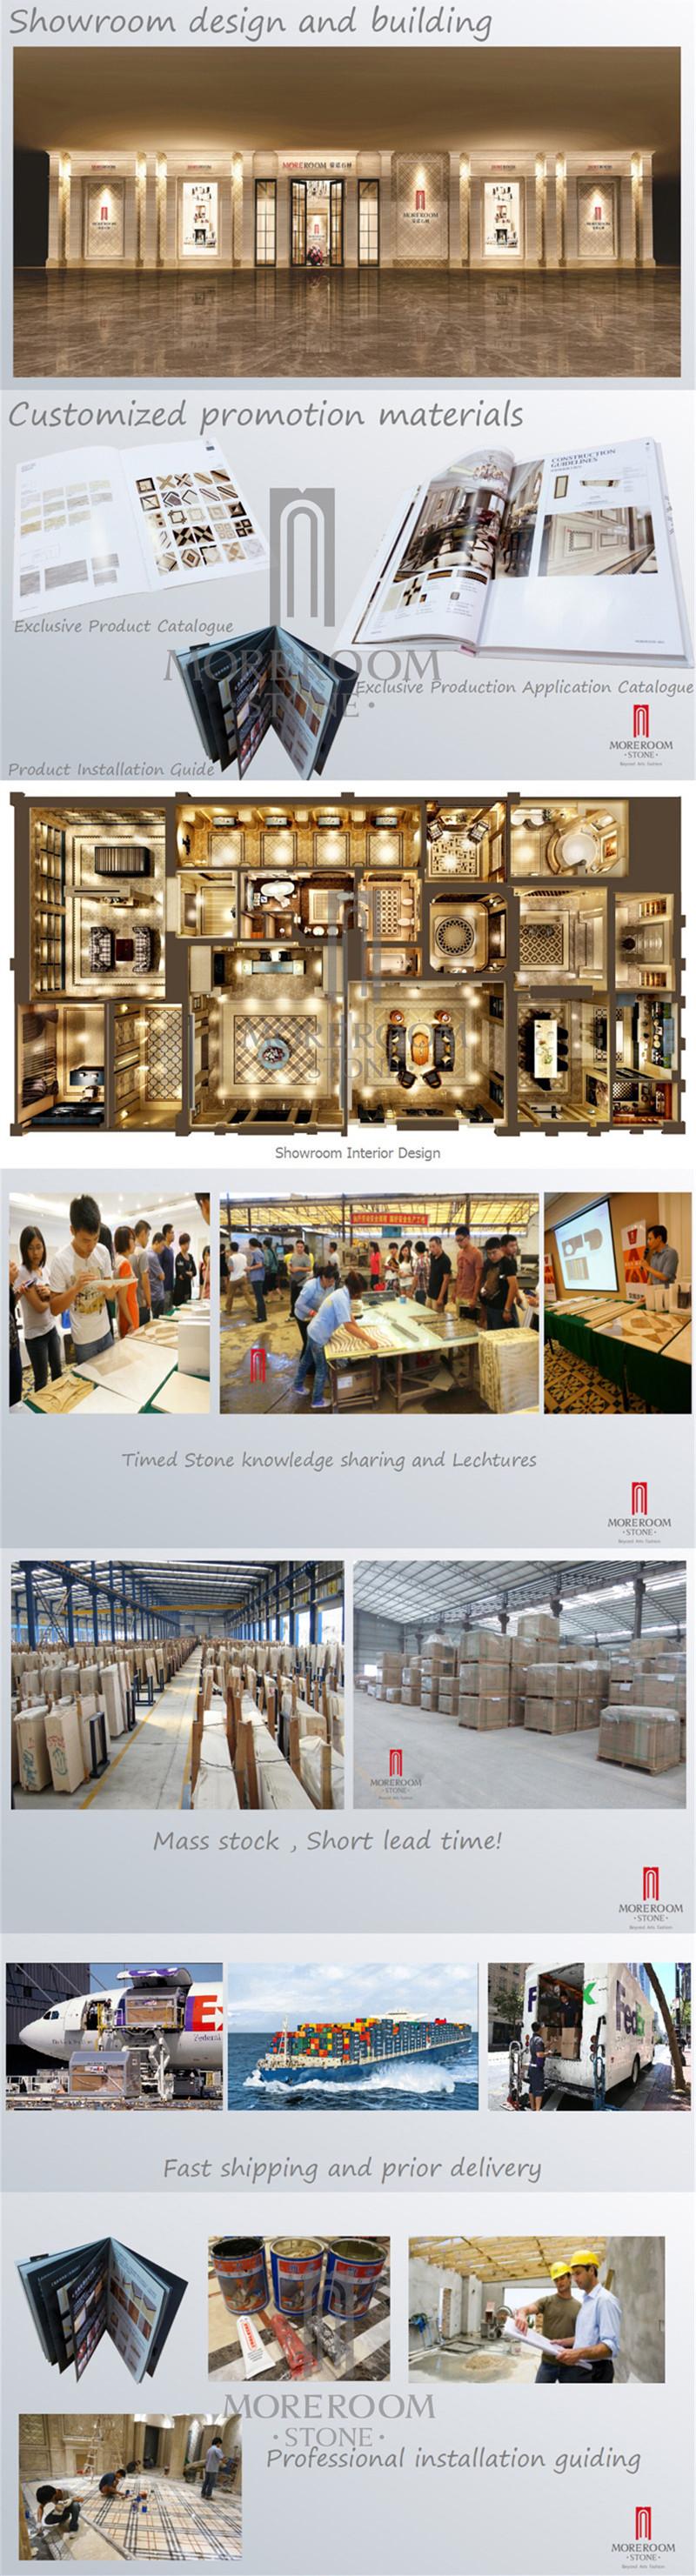 star hotel lobby design waterjet marble floor pattern in portugal